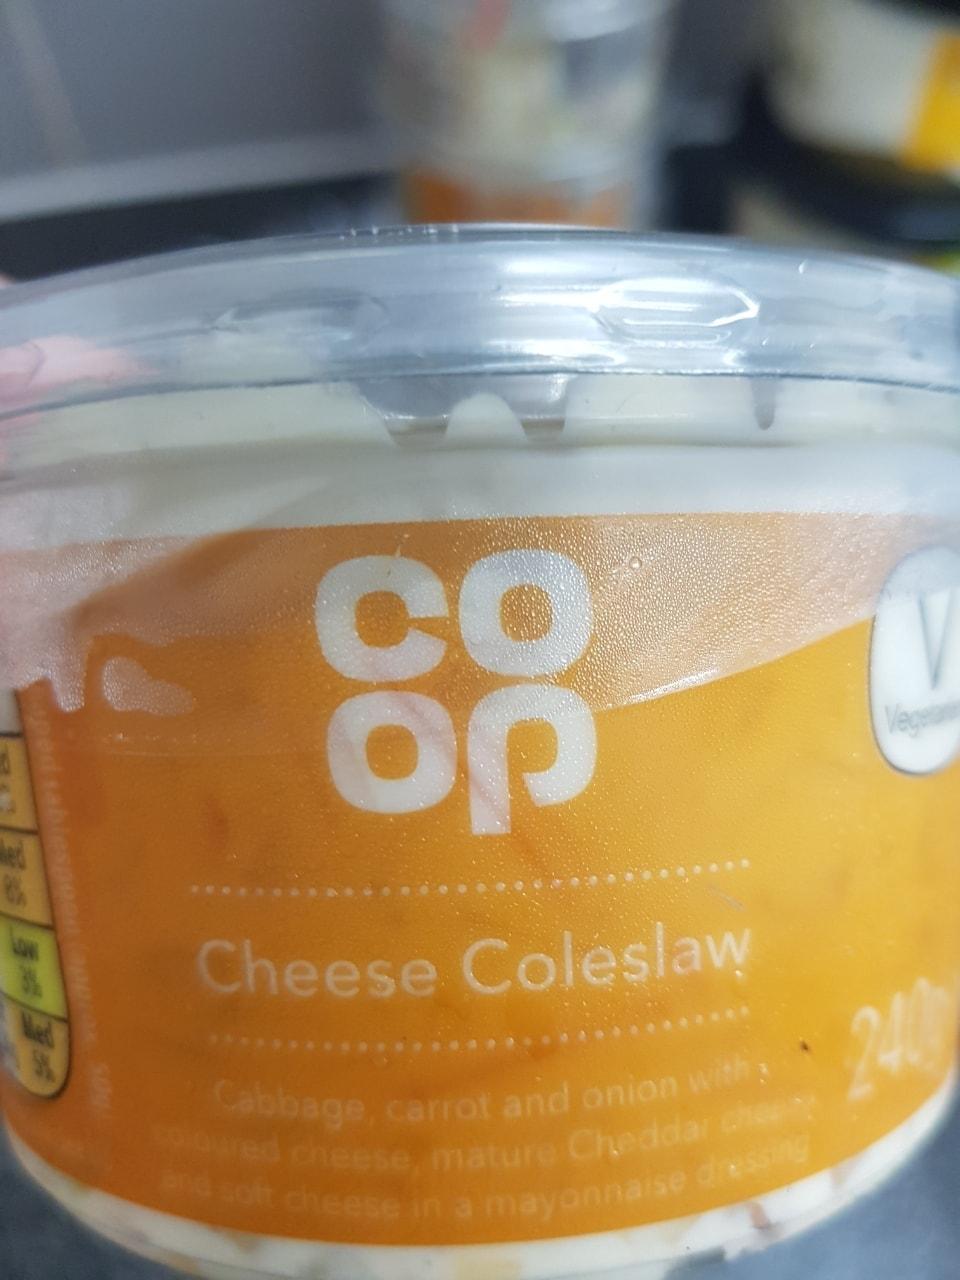 Cheese coleslaw